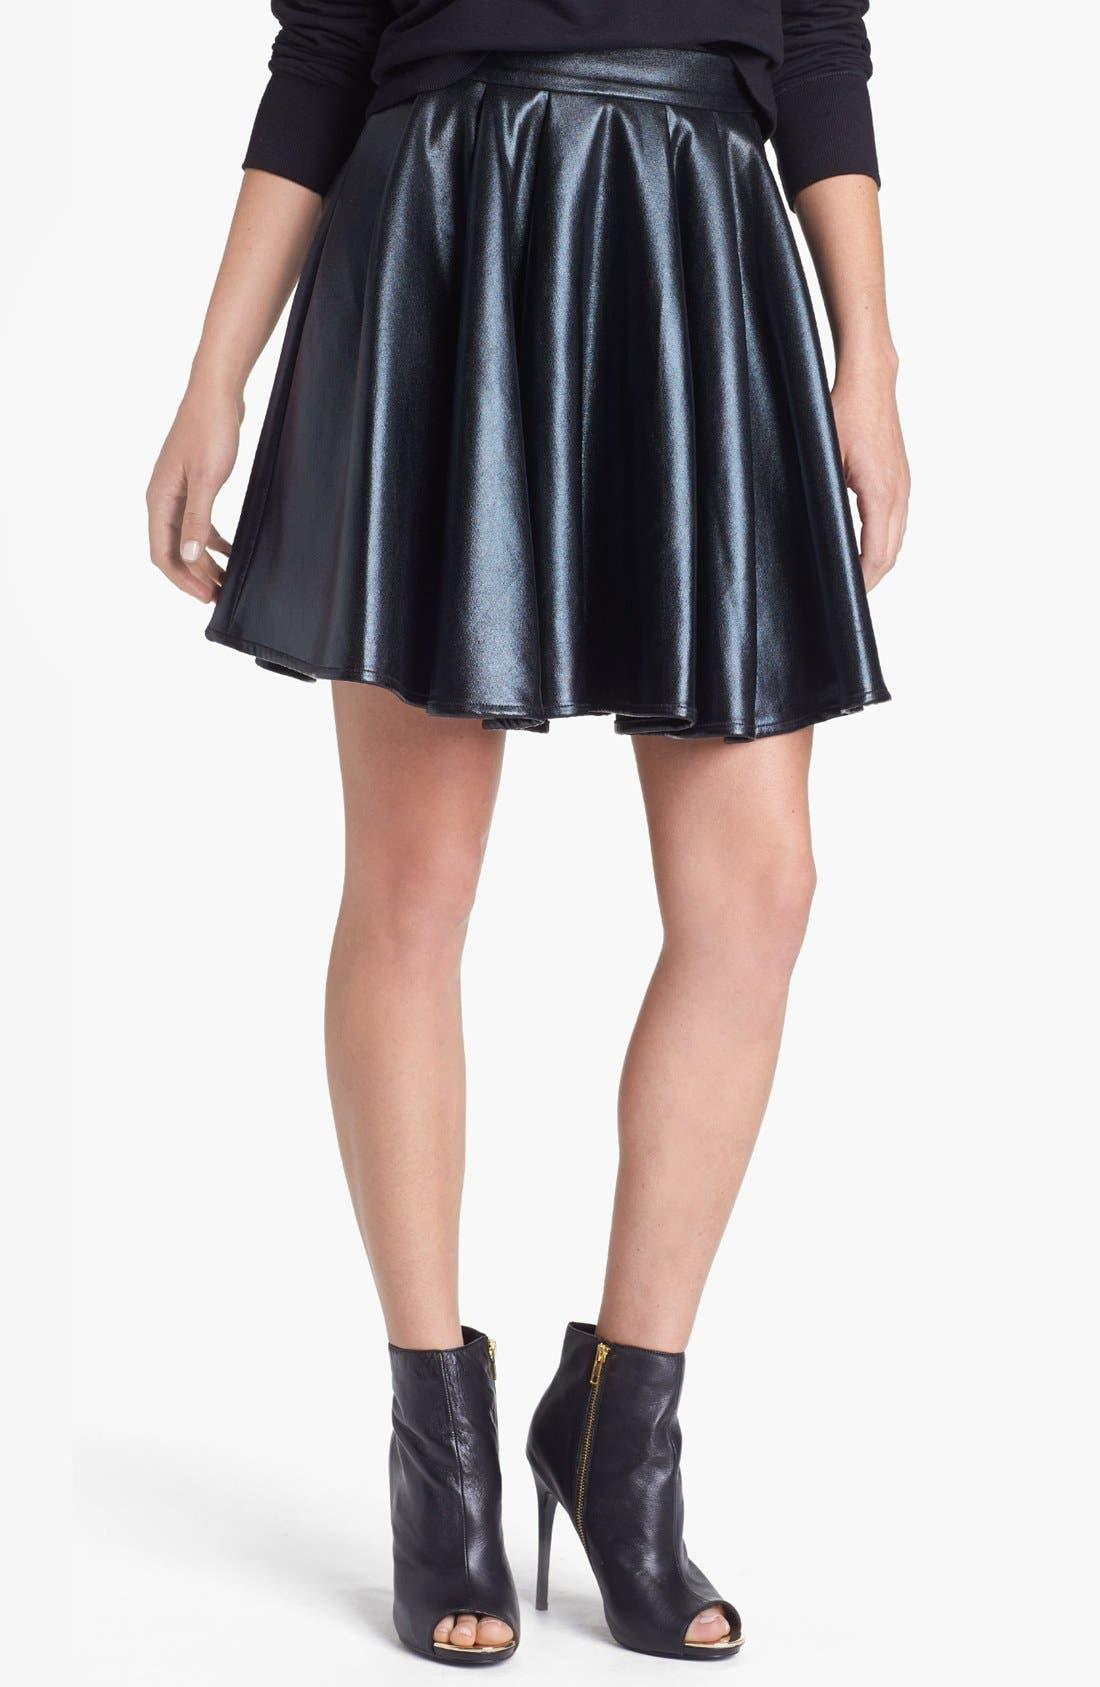 Main Image - ELEVENPARIS 'Timac' Faux Leather Skater Skirt